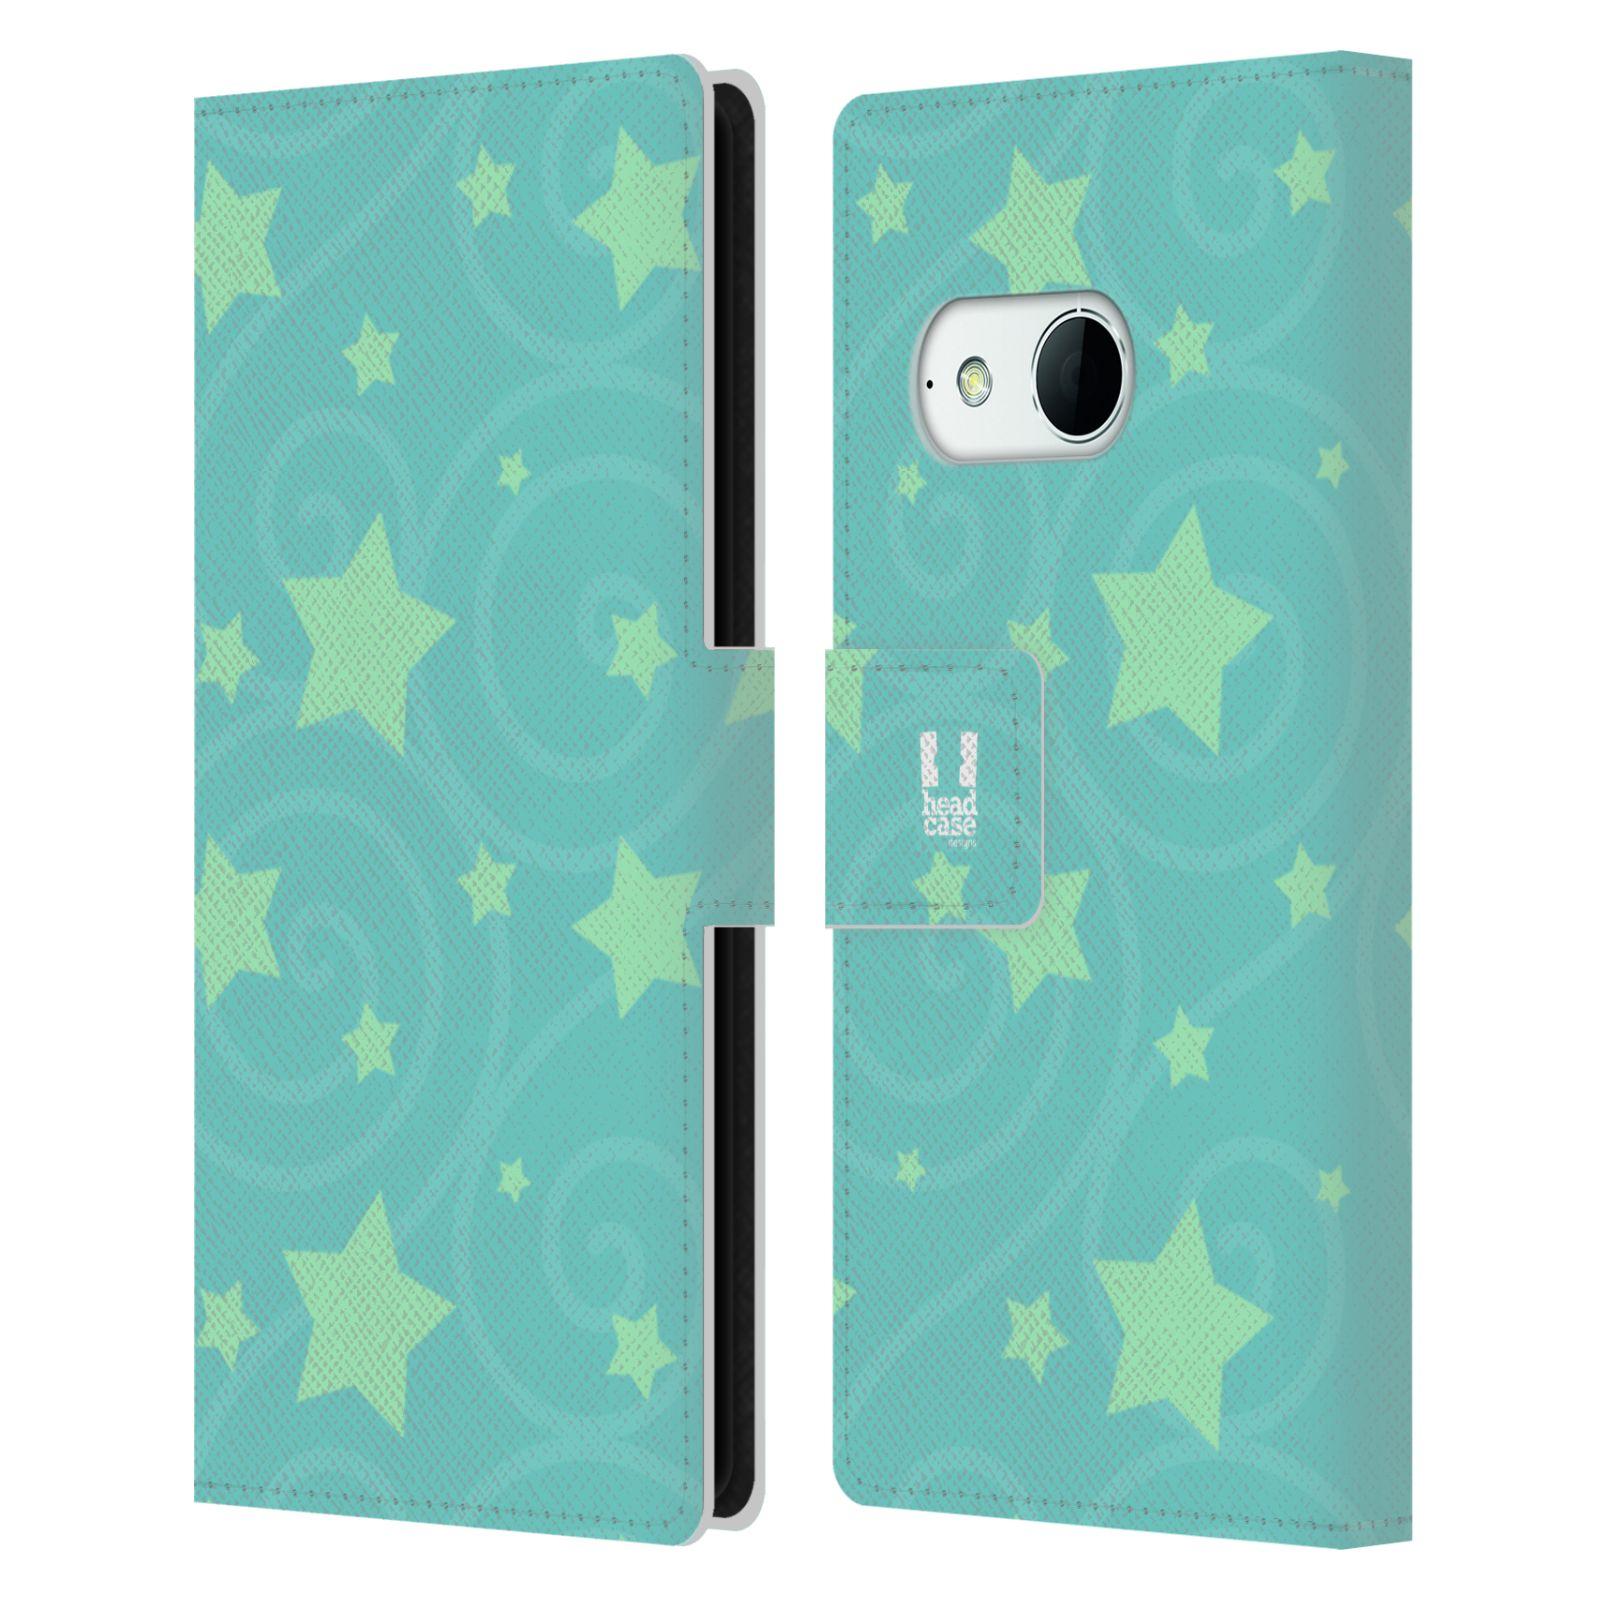 HEAD CASE Flipové pouzdro pro mobil HTC ONE MINI 2 (M8) vzor hvězdičky modrá